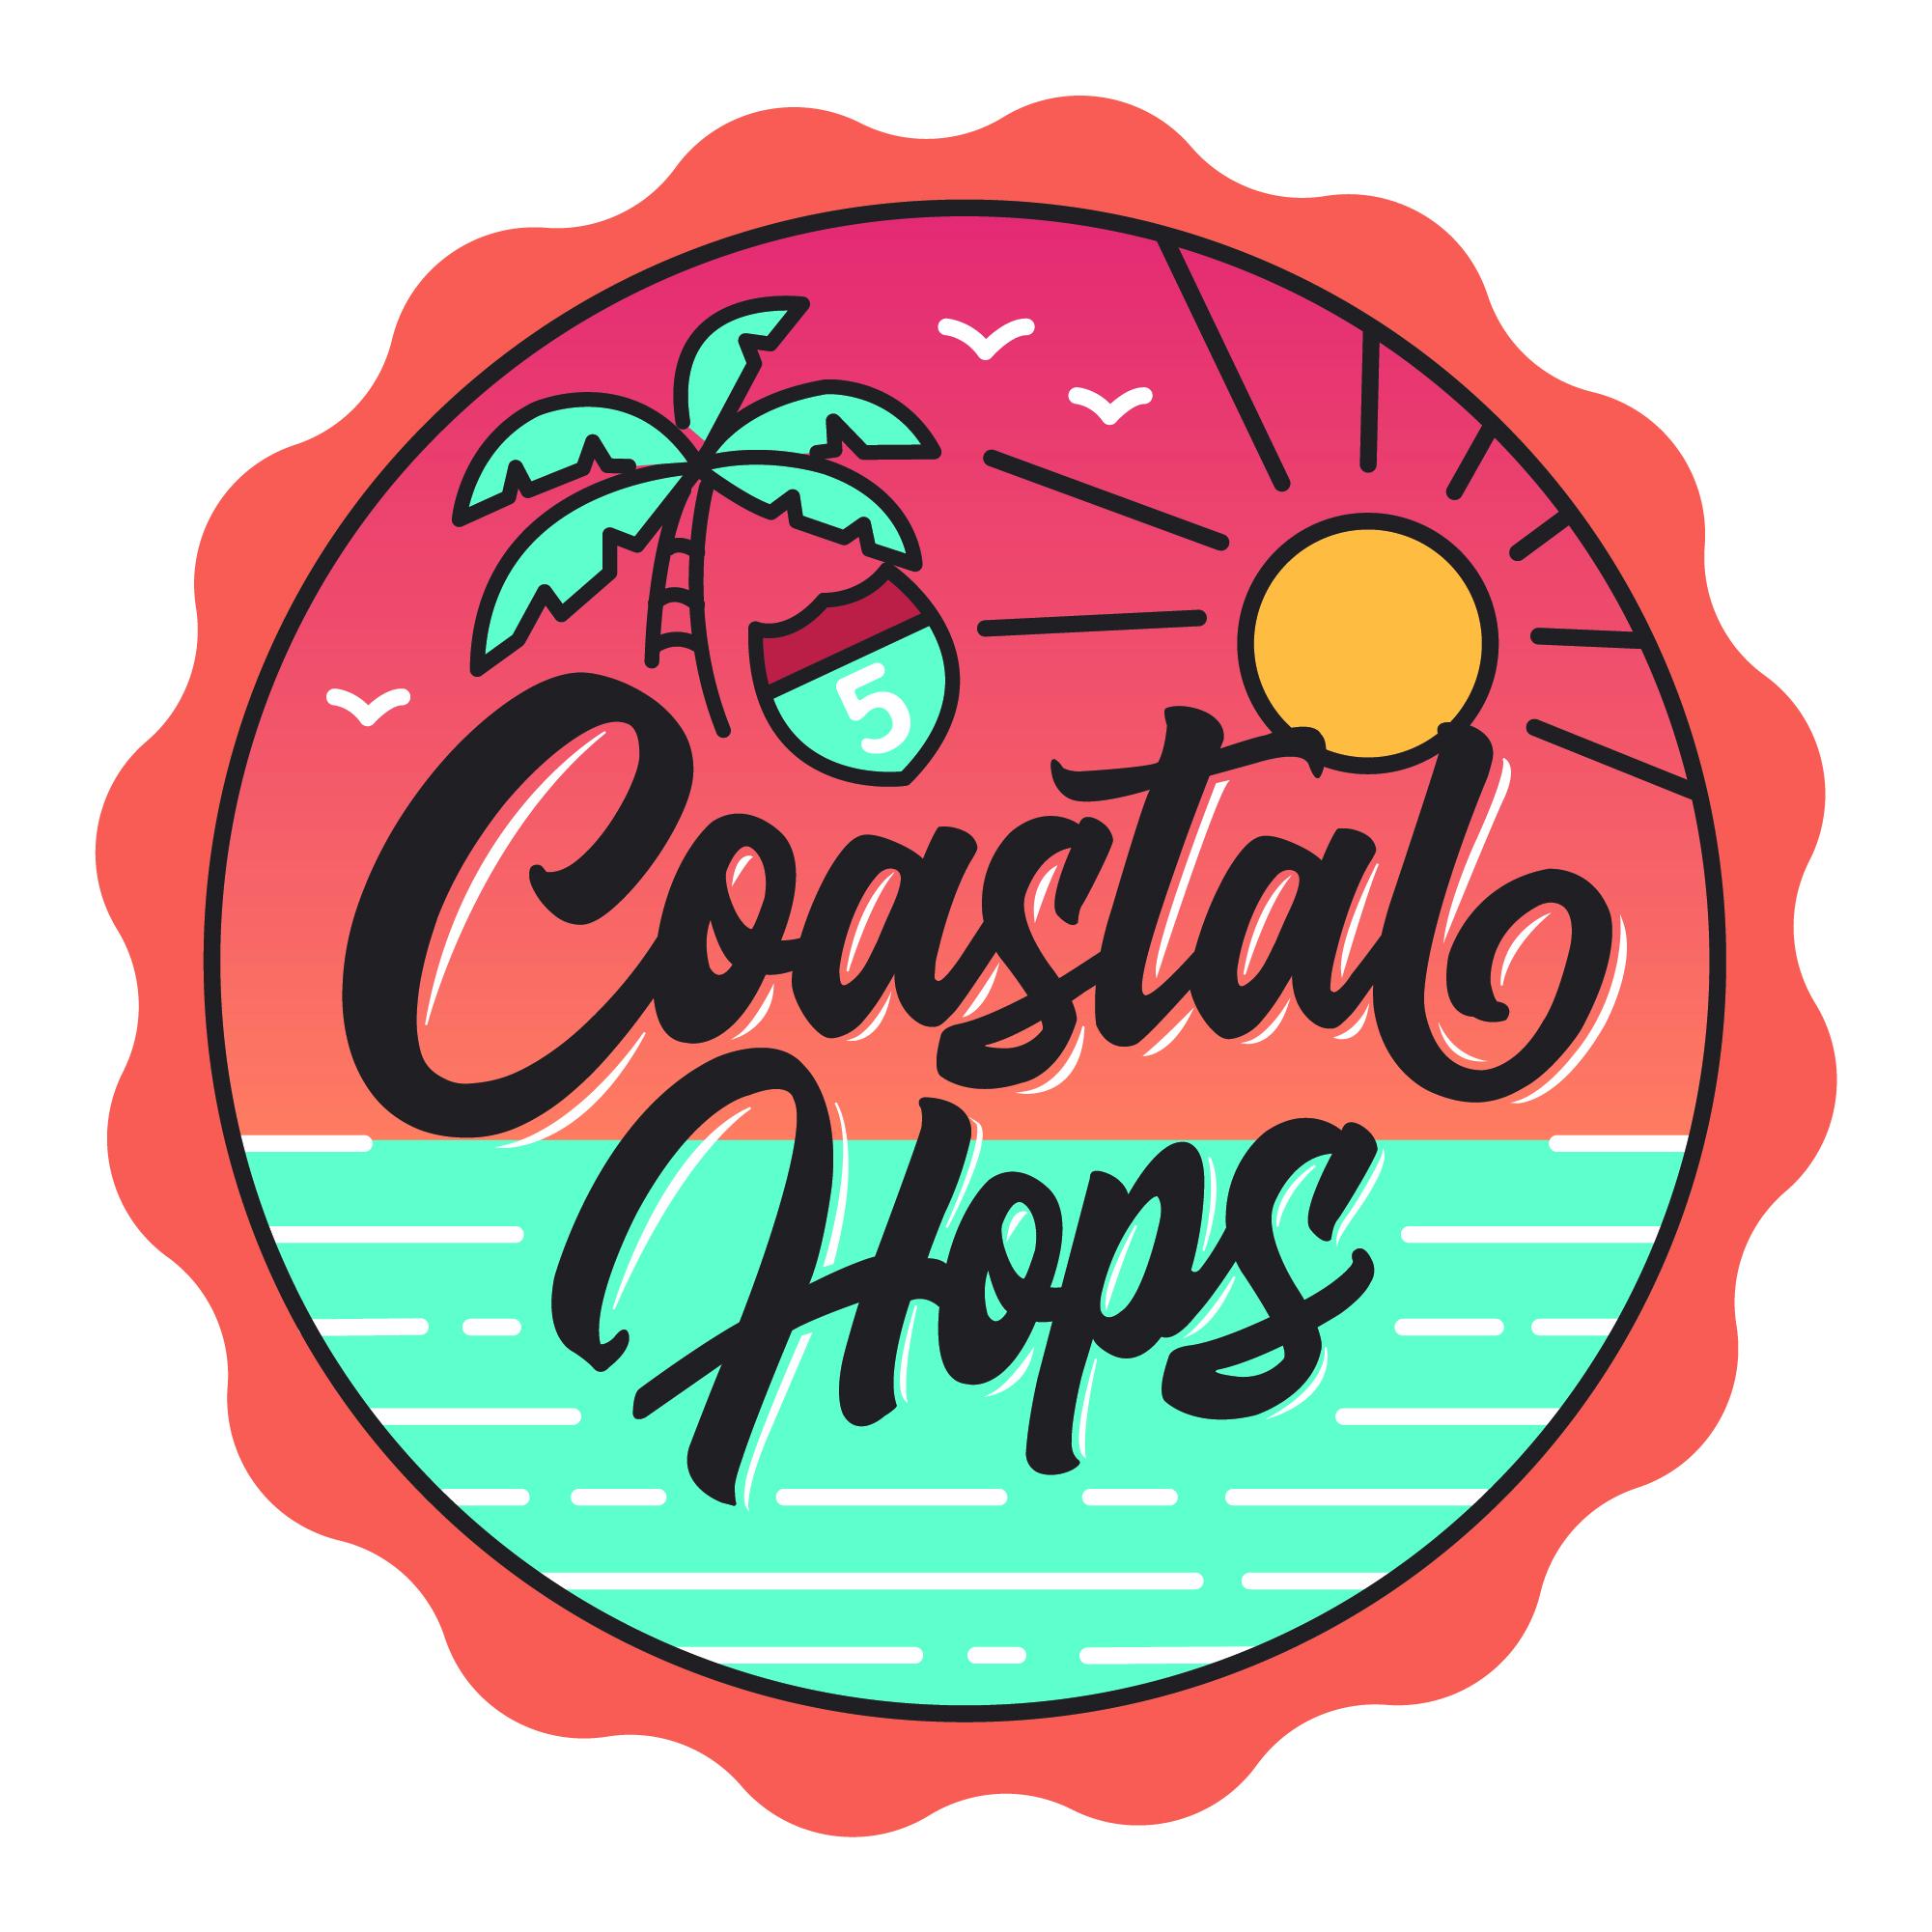 Coastal Hops